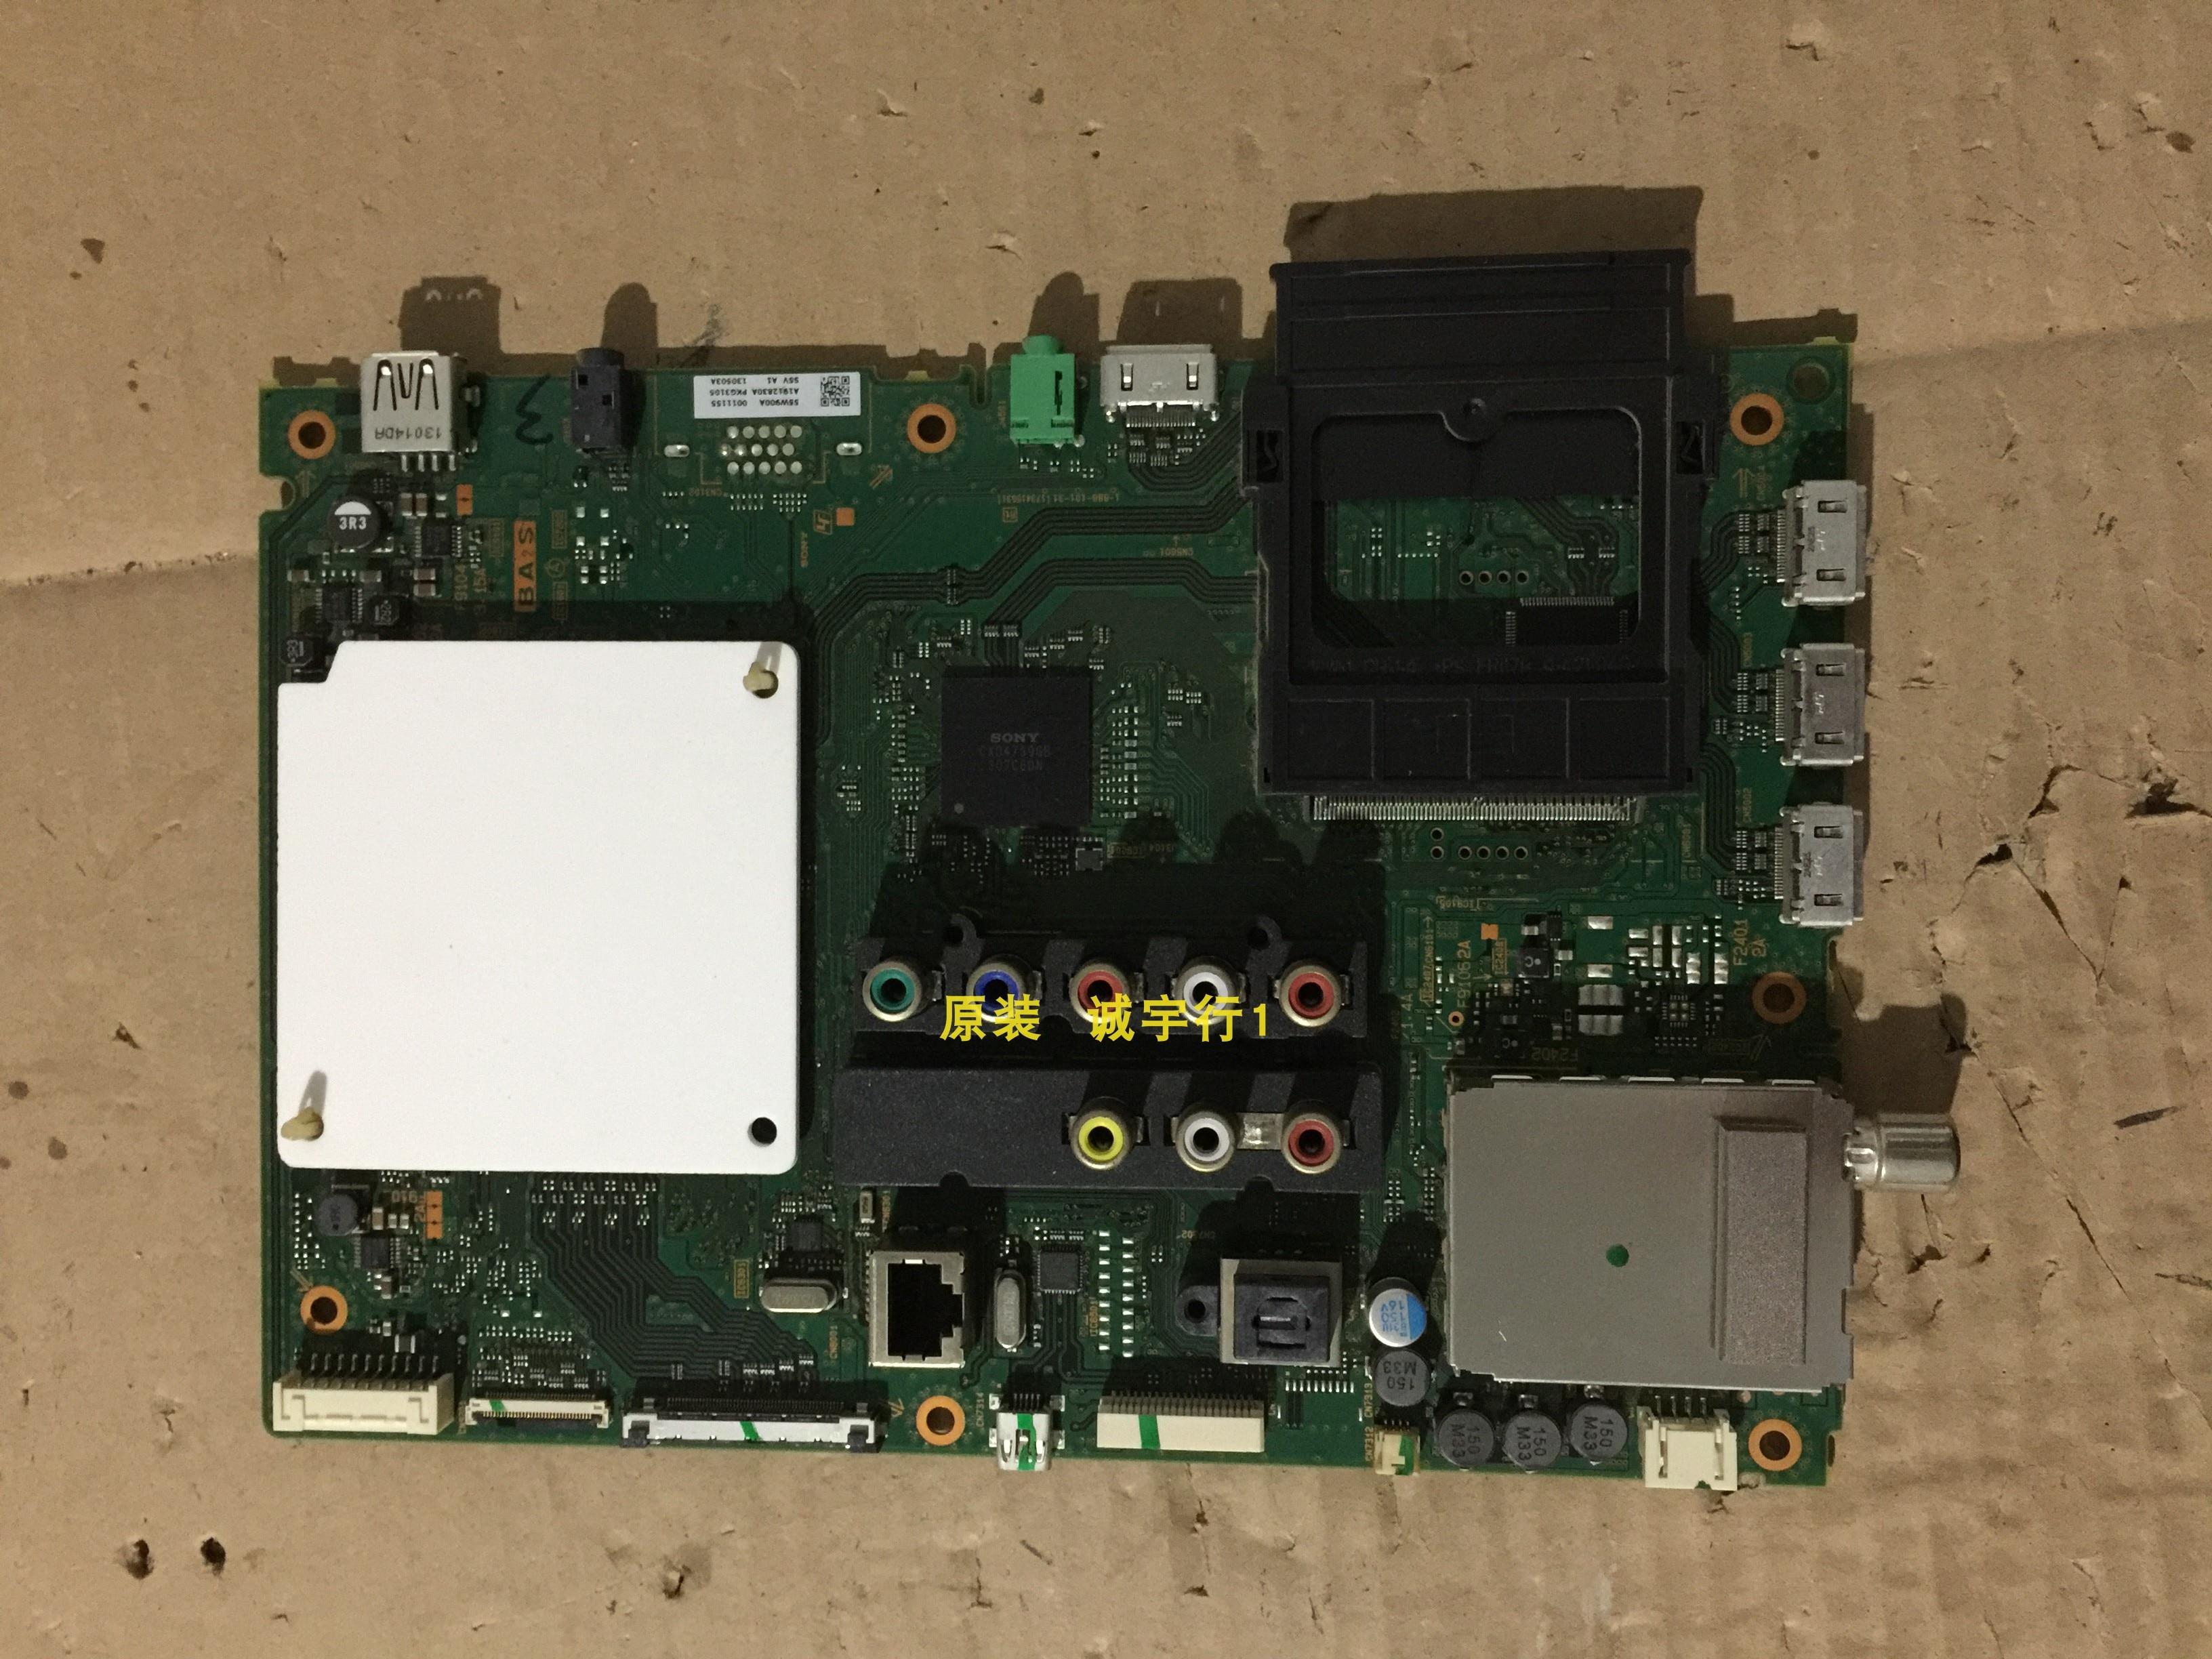 KDL-55W900A placa mãe 1-888-101-31 para tela YLV5522-02N